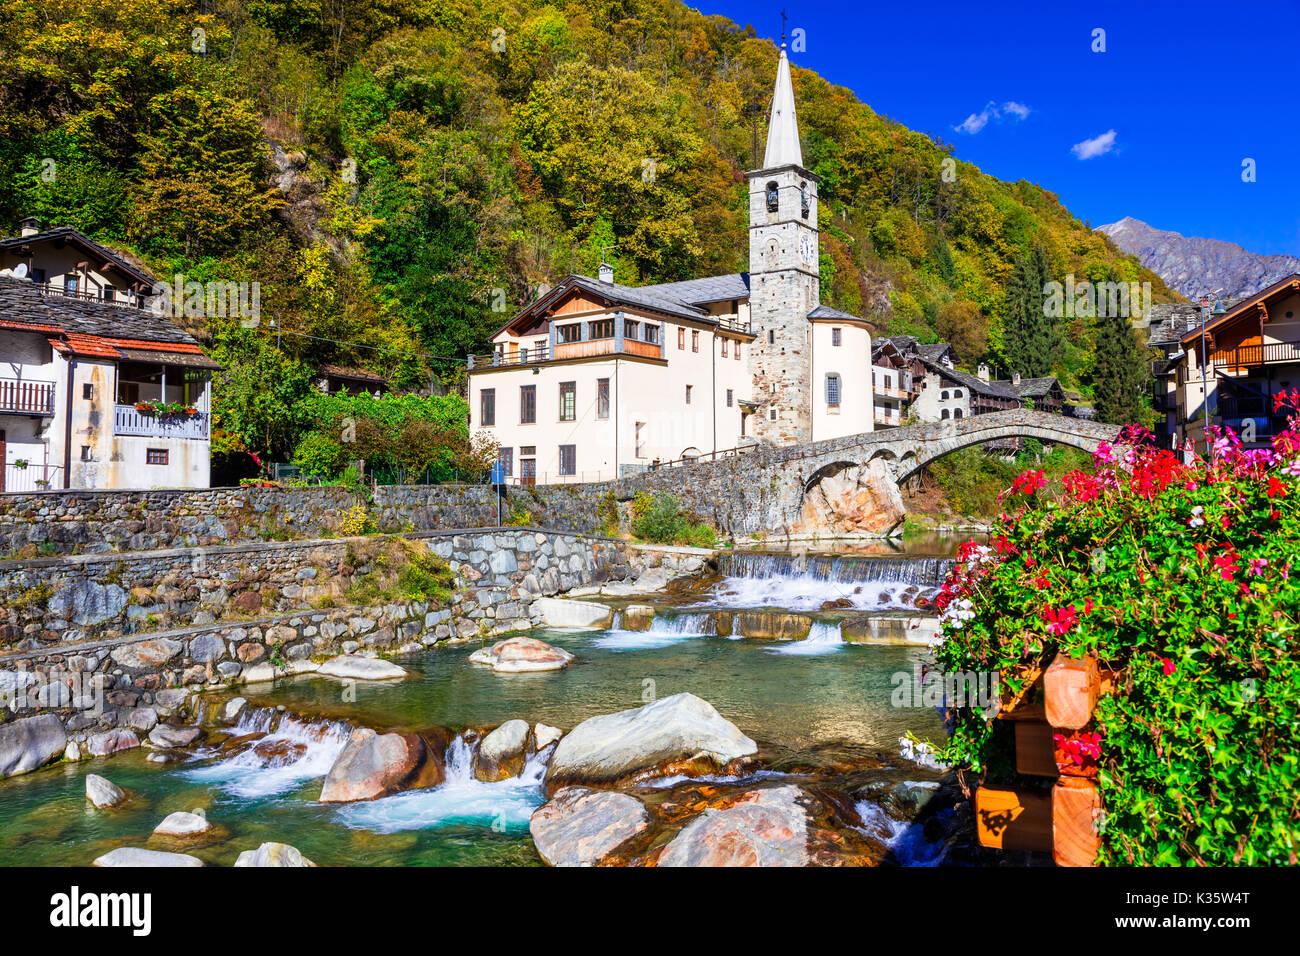 Lillianes picturale,village valle d'aoste,italie. Photo Stock